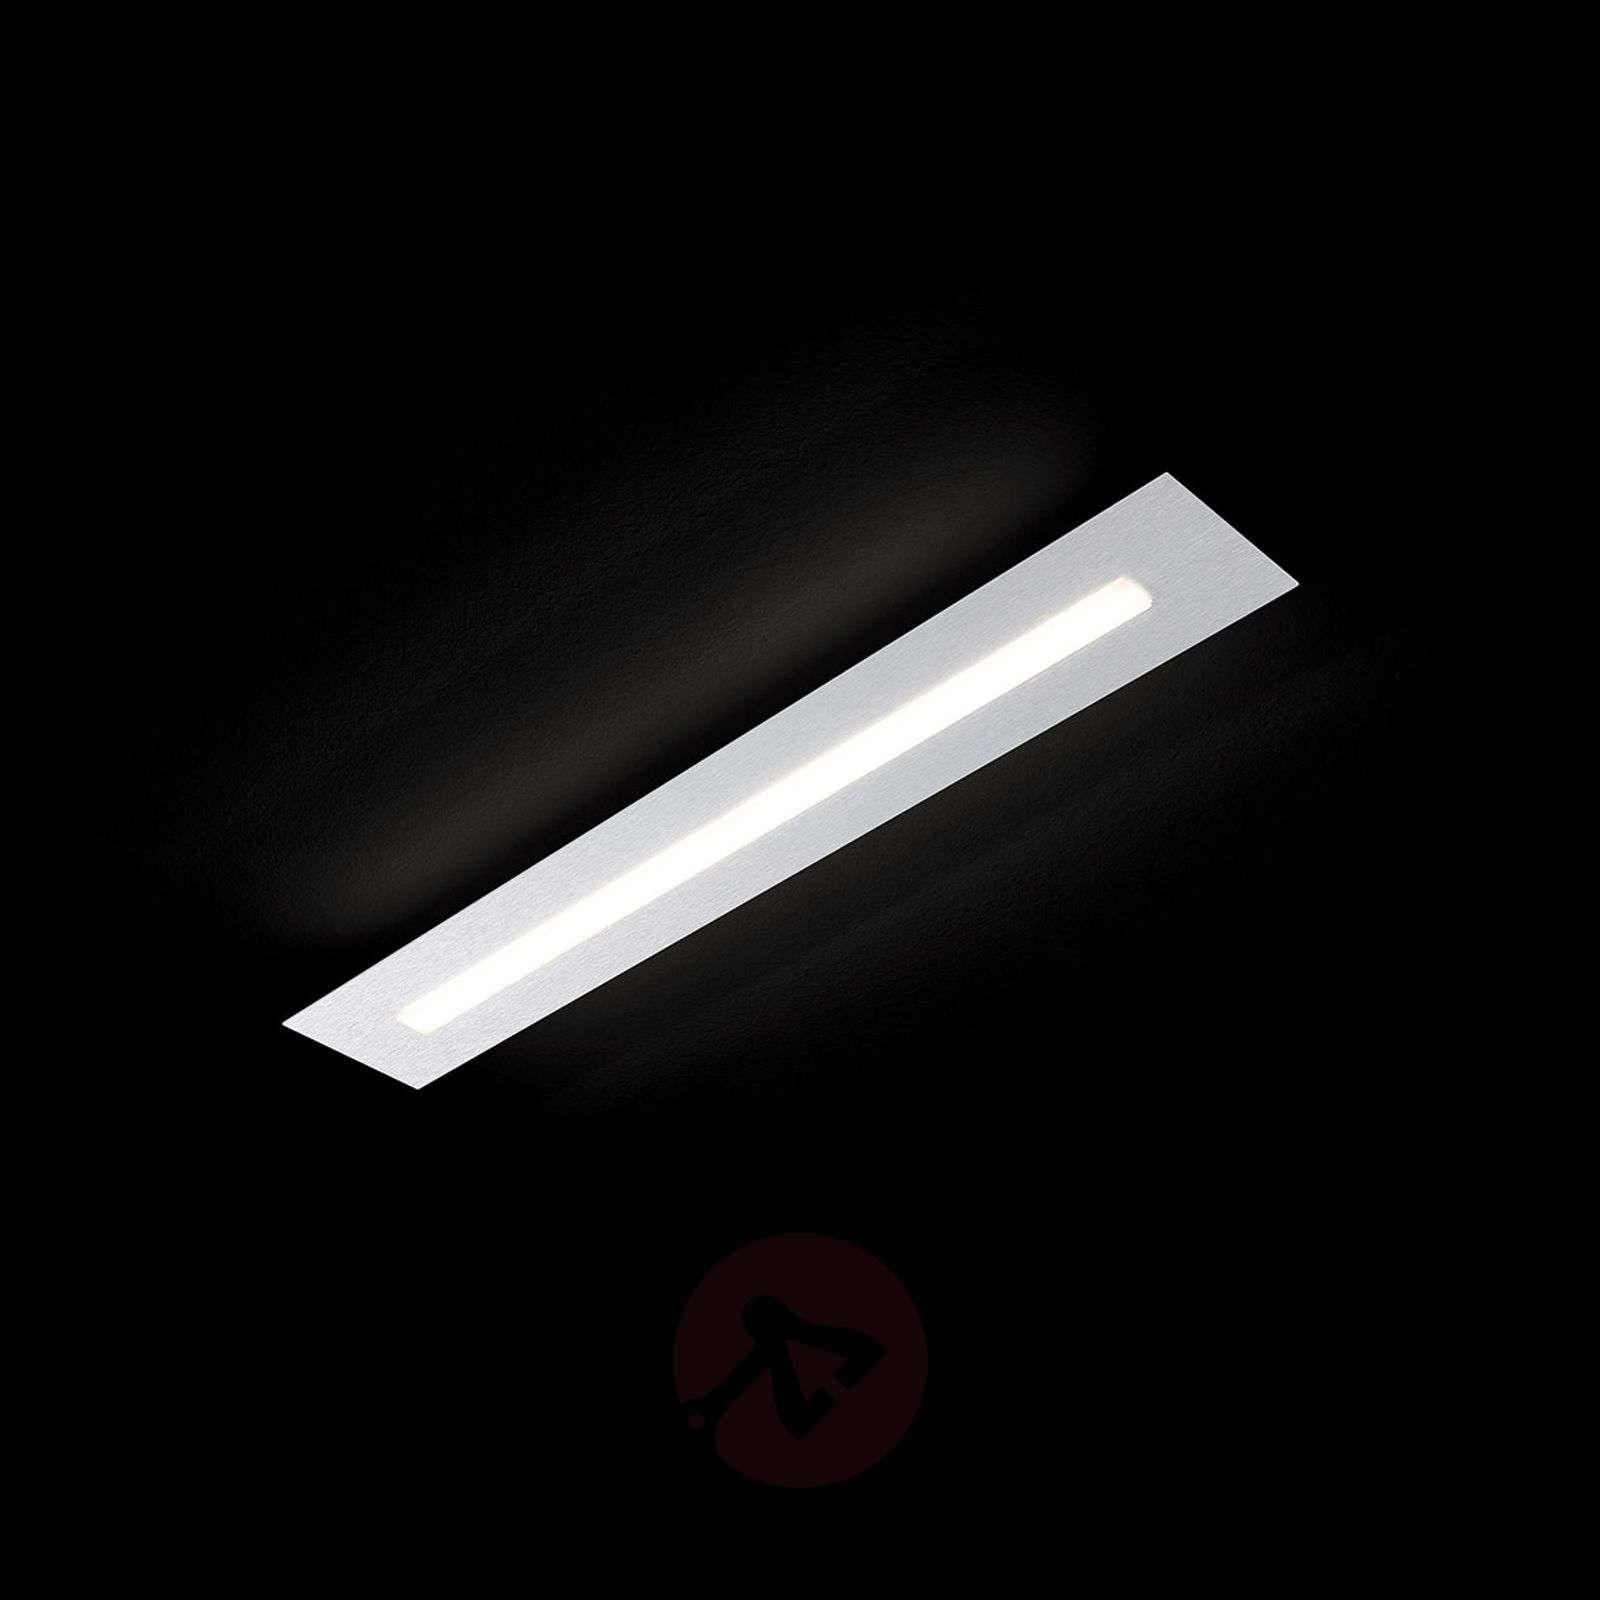 GROSSMANN Fis LED-kattovalaisin, 57 cm-4022025-01